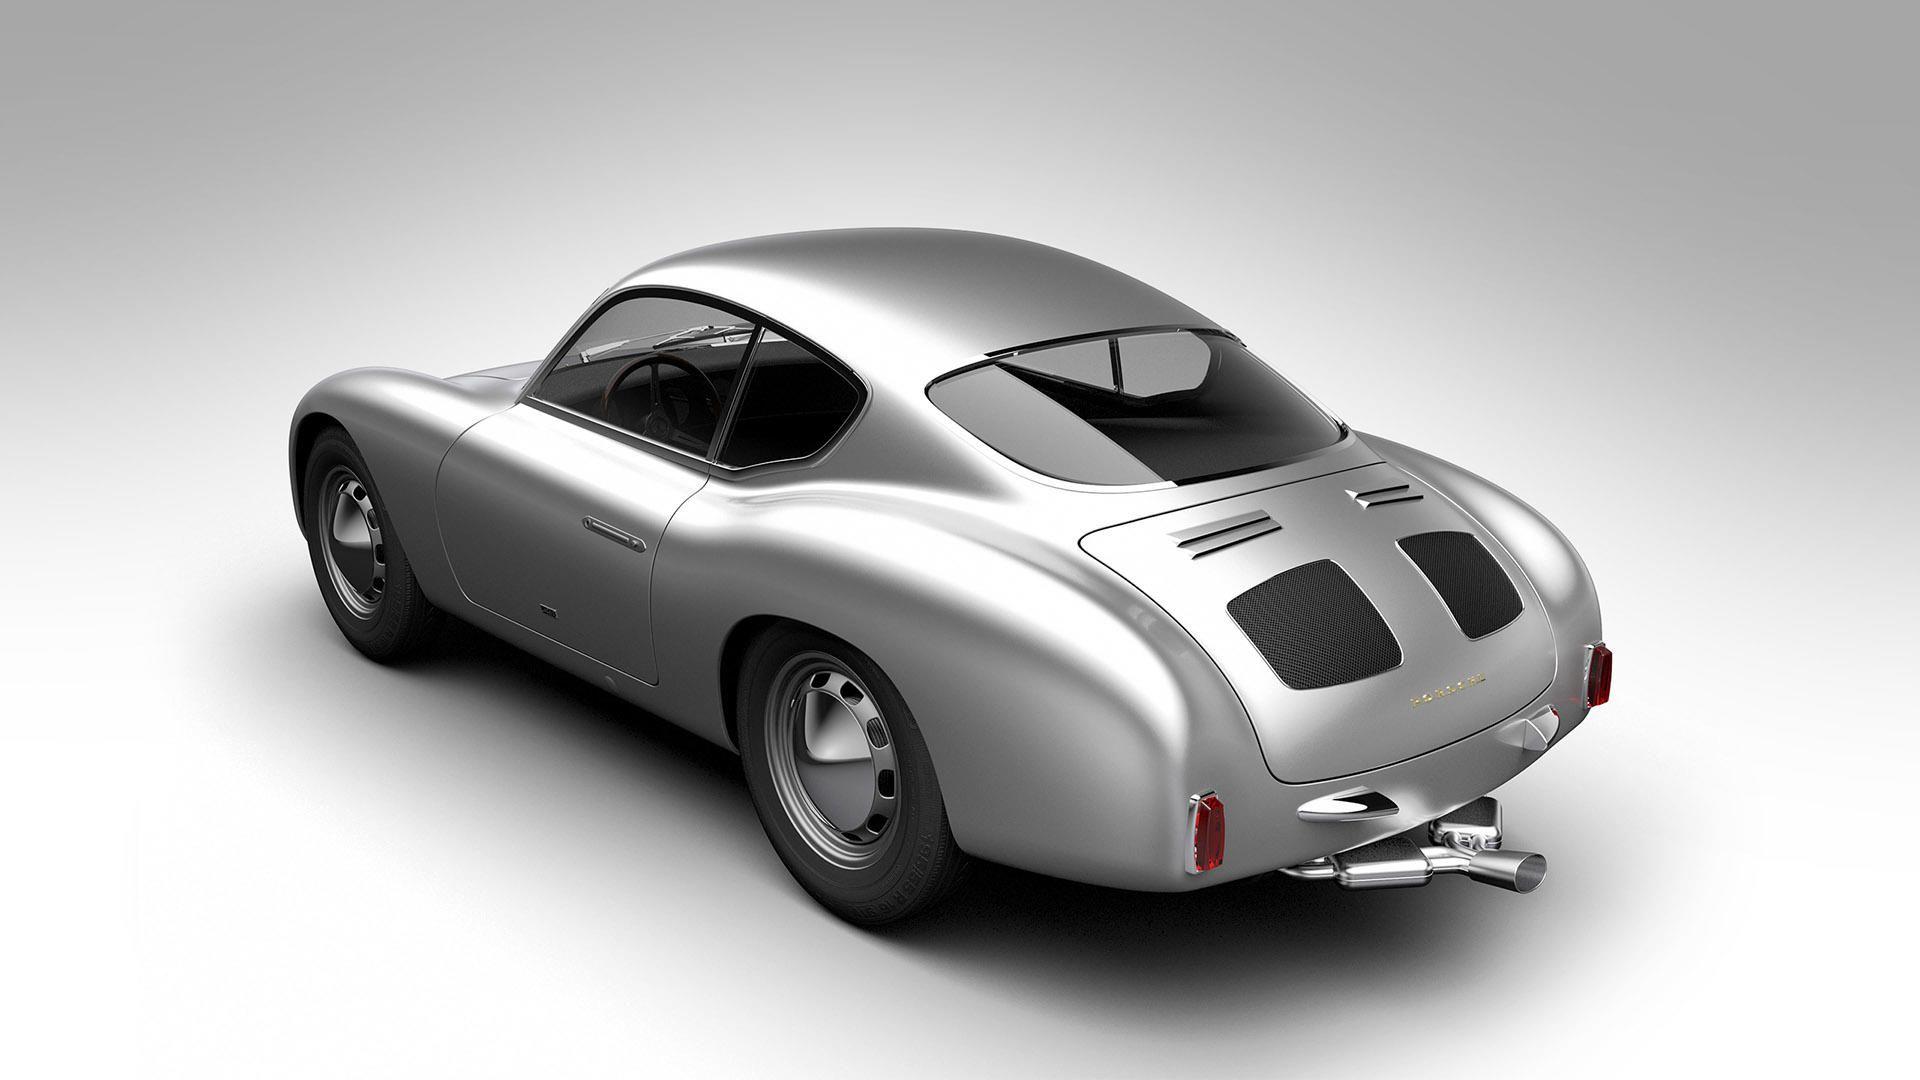 Zagato is reviving two incredible Porsche 356 projects   Porsche 356 ...